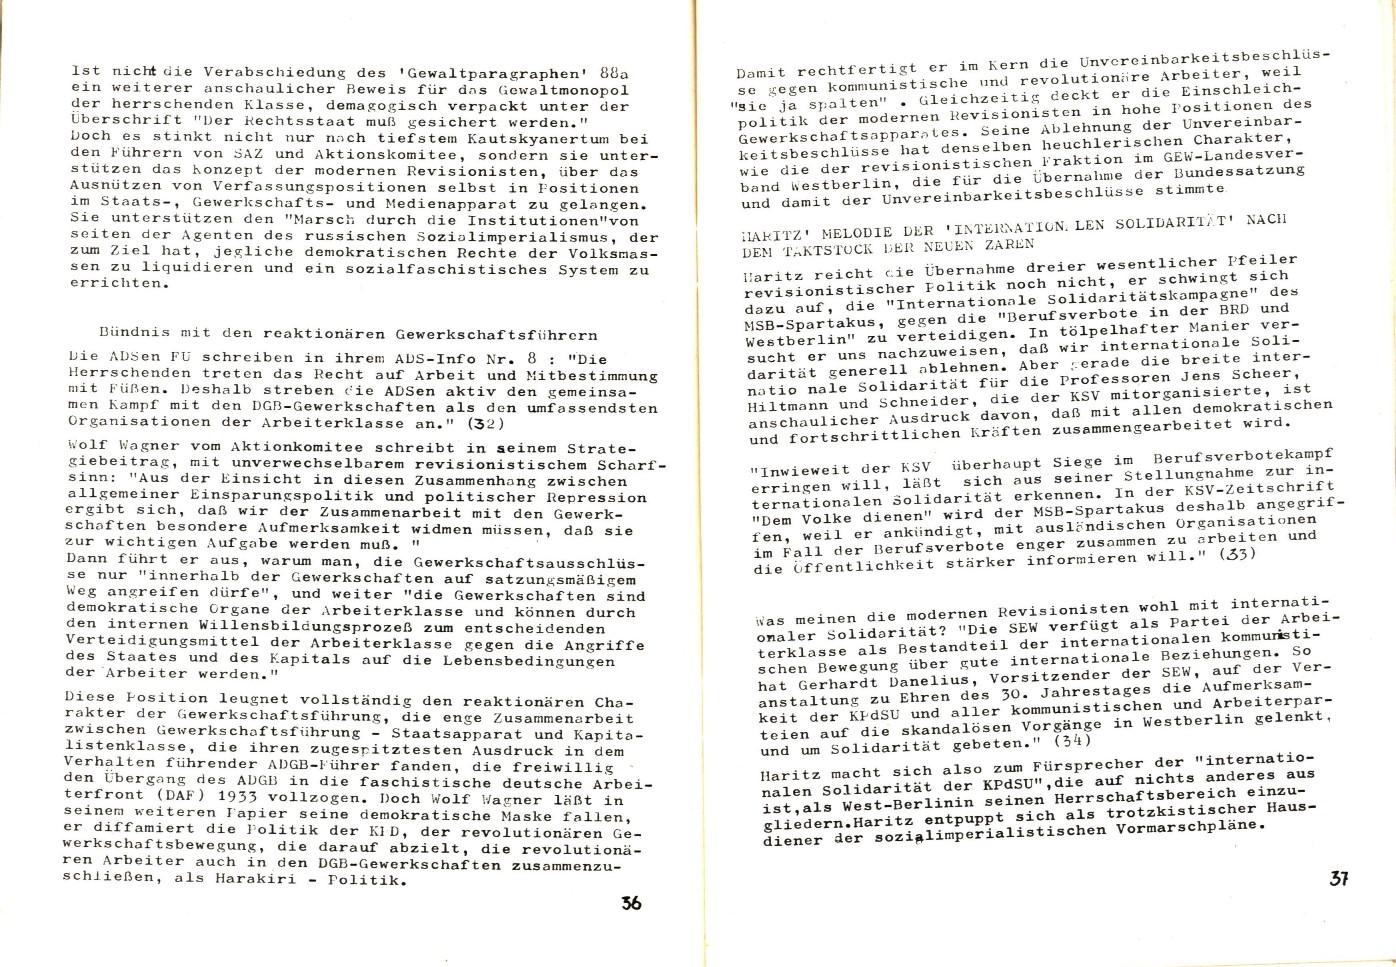 Berlin_KSV_1975_Dokumente_der_SAZ_20